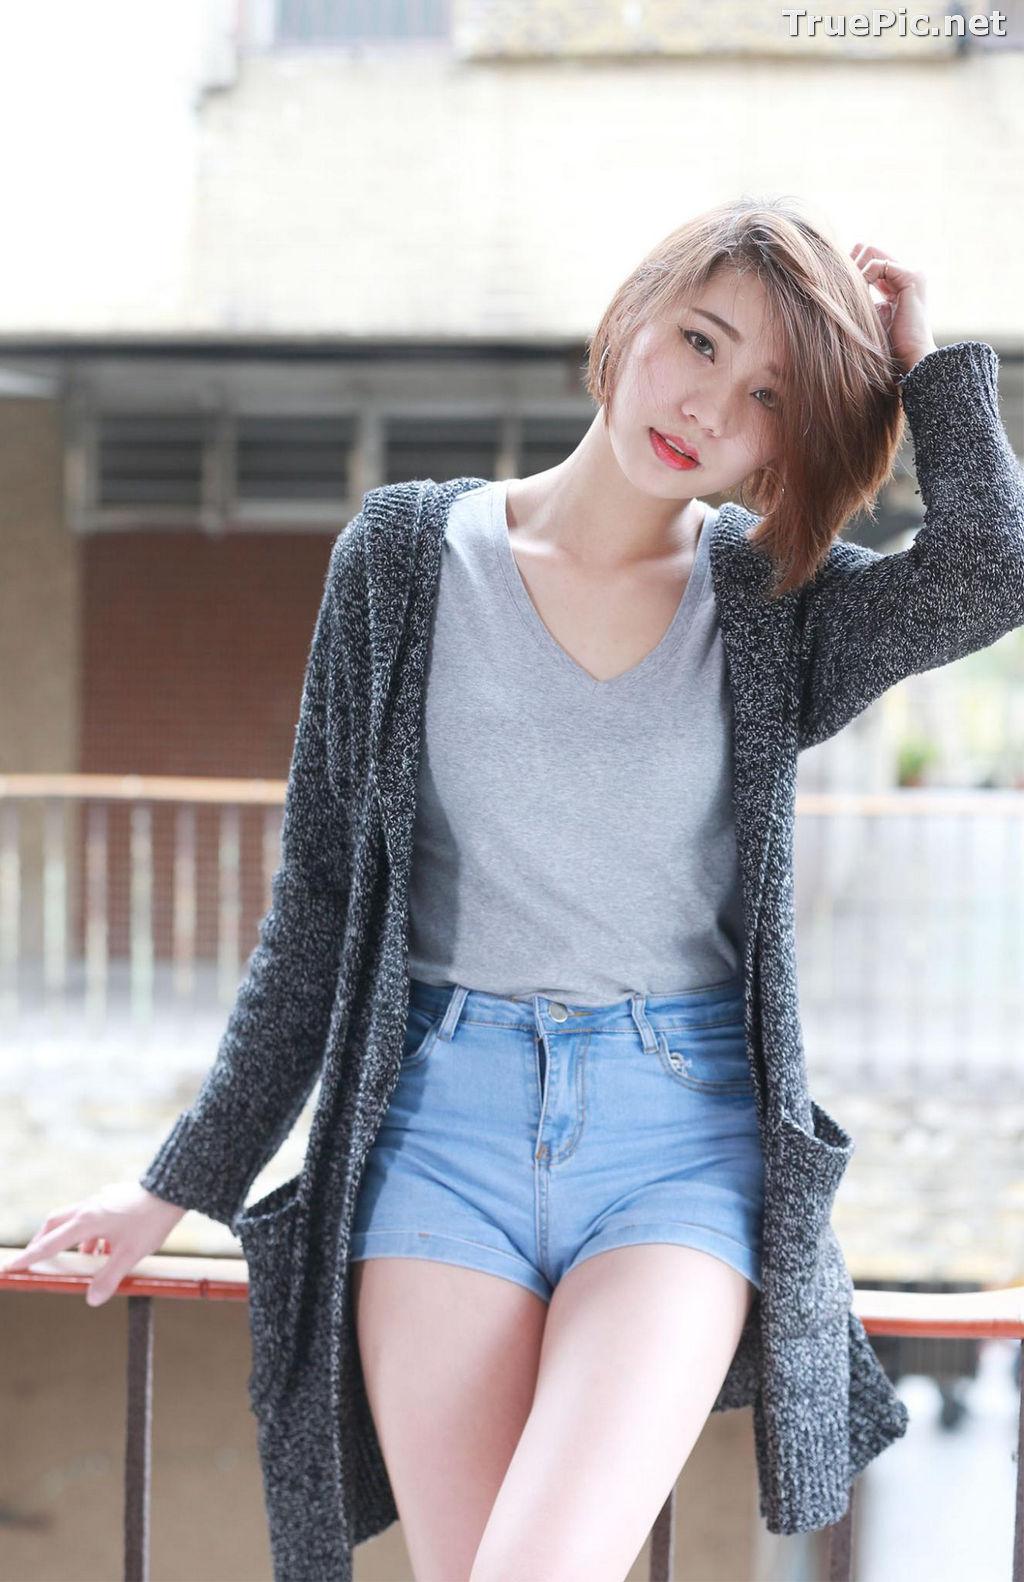 Image Pretty Taiwan Showgirl - 黃竹萱 - Beautiful Long Legs Girl - TruePic.net - Picture-5